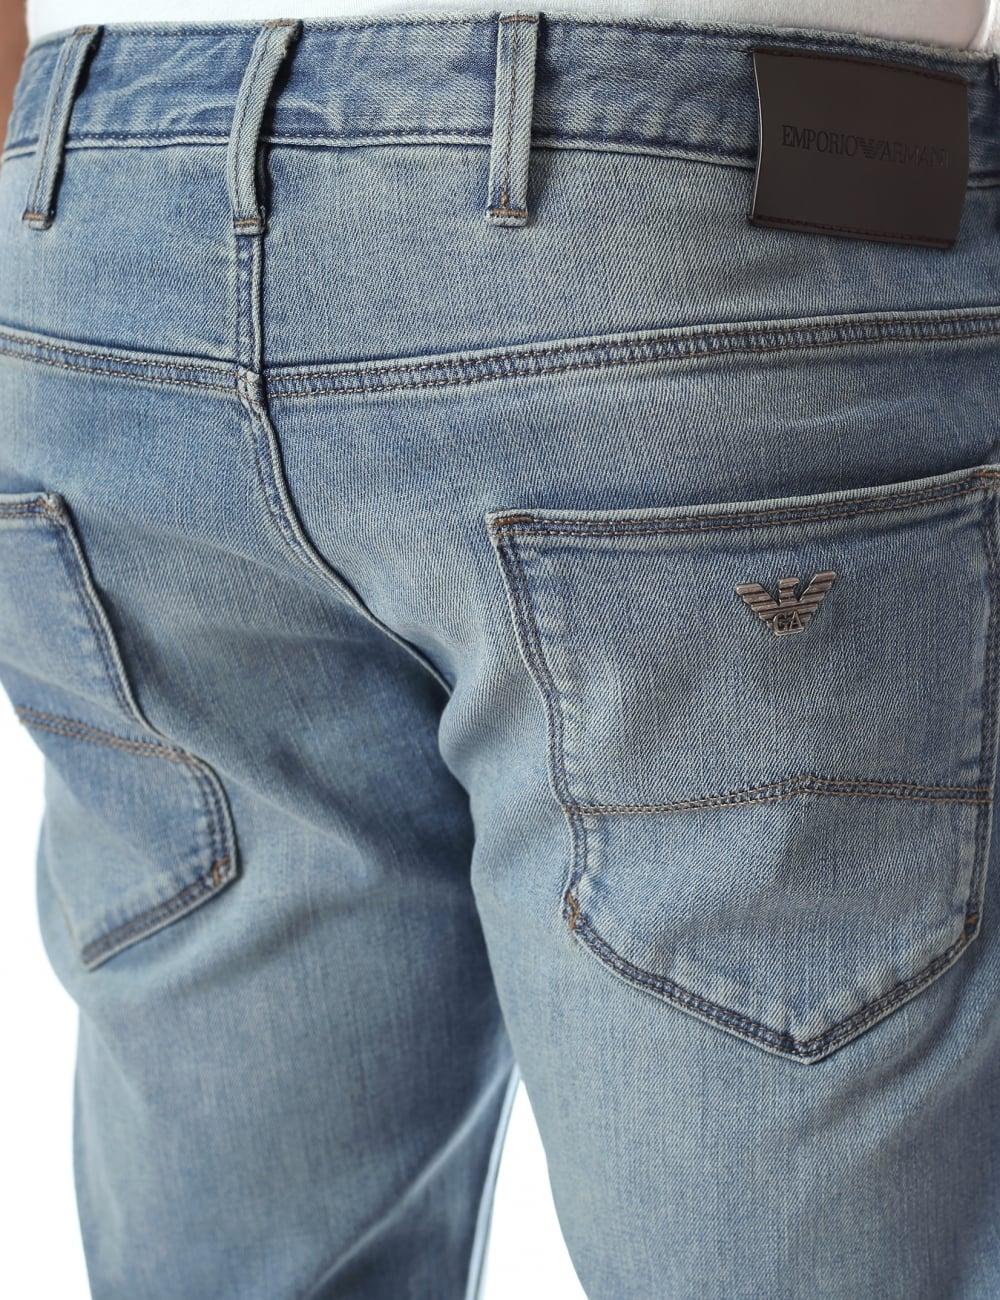 d3c598f80525c Emporio Armani J06 Men s Regular Fit Stone Wash Jean